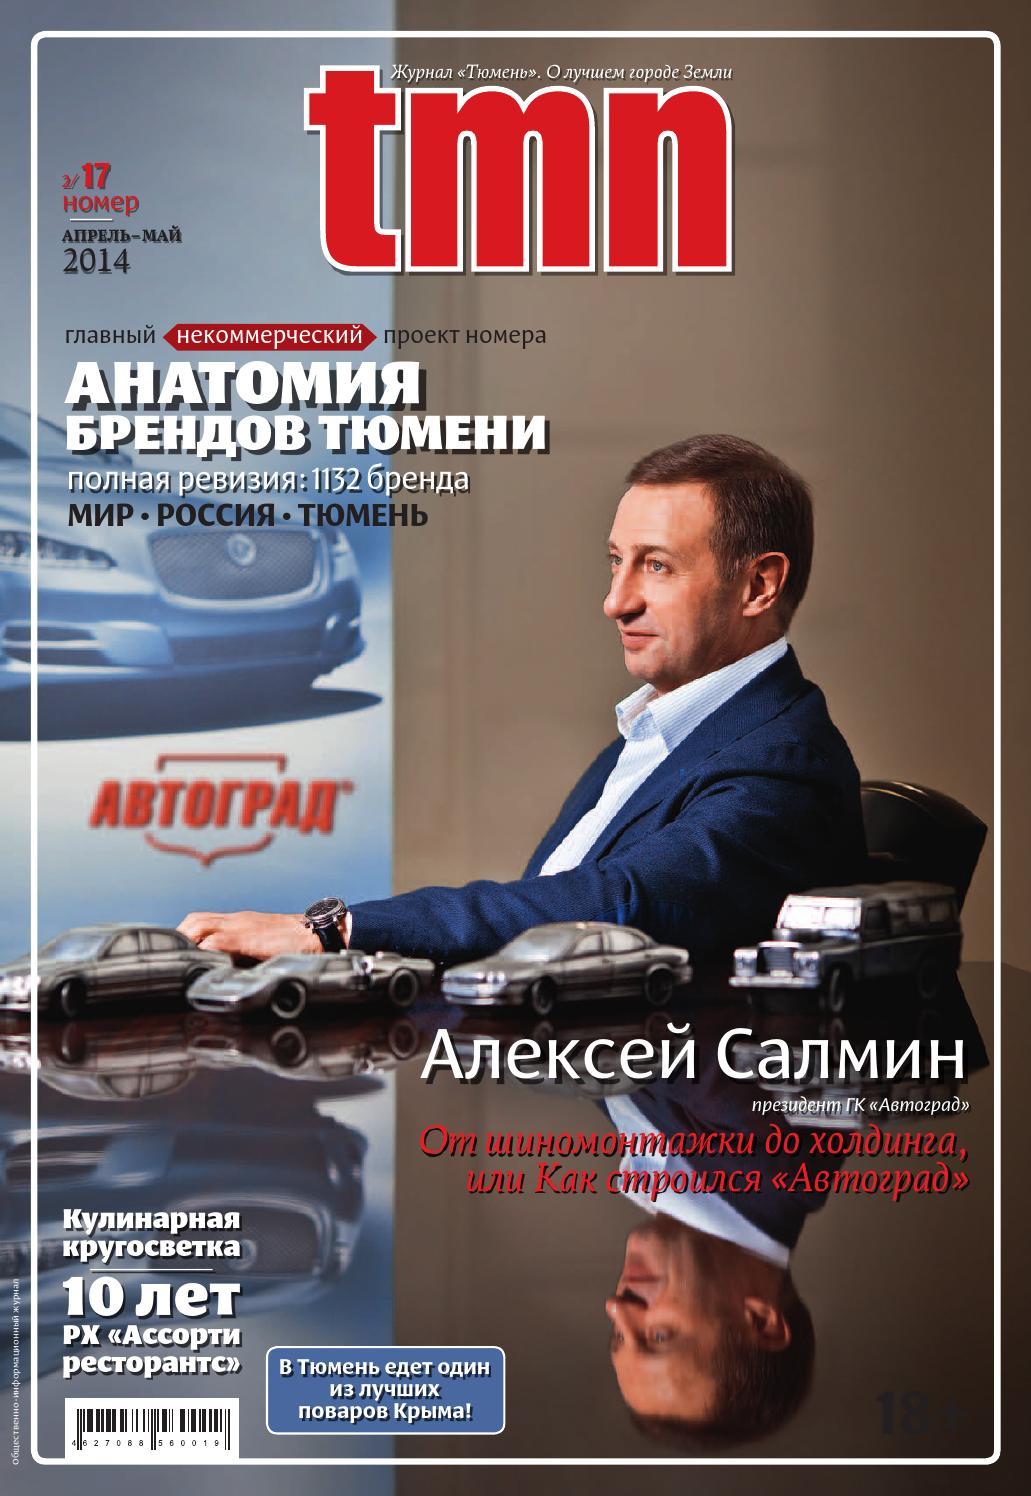 Дмитрий фатеев дубай газпром программа аэропорт дубай